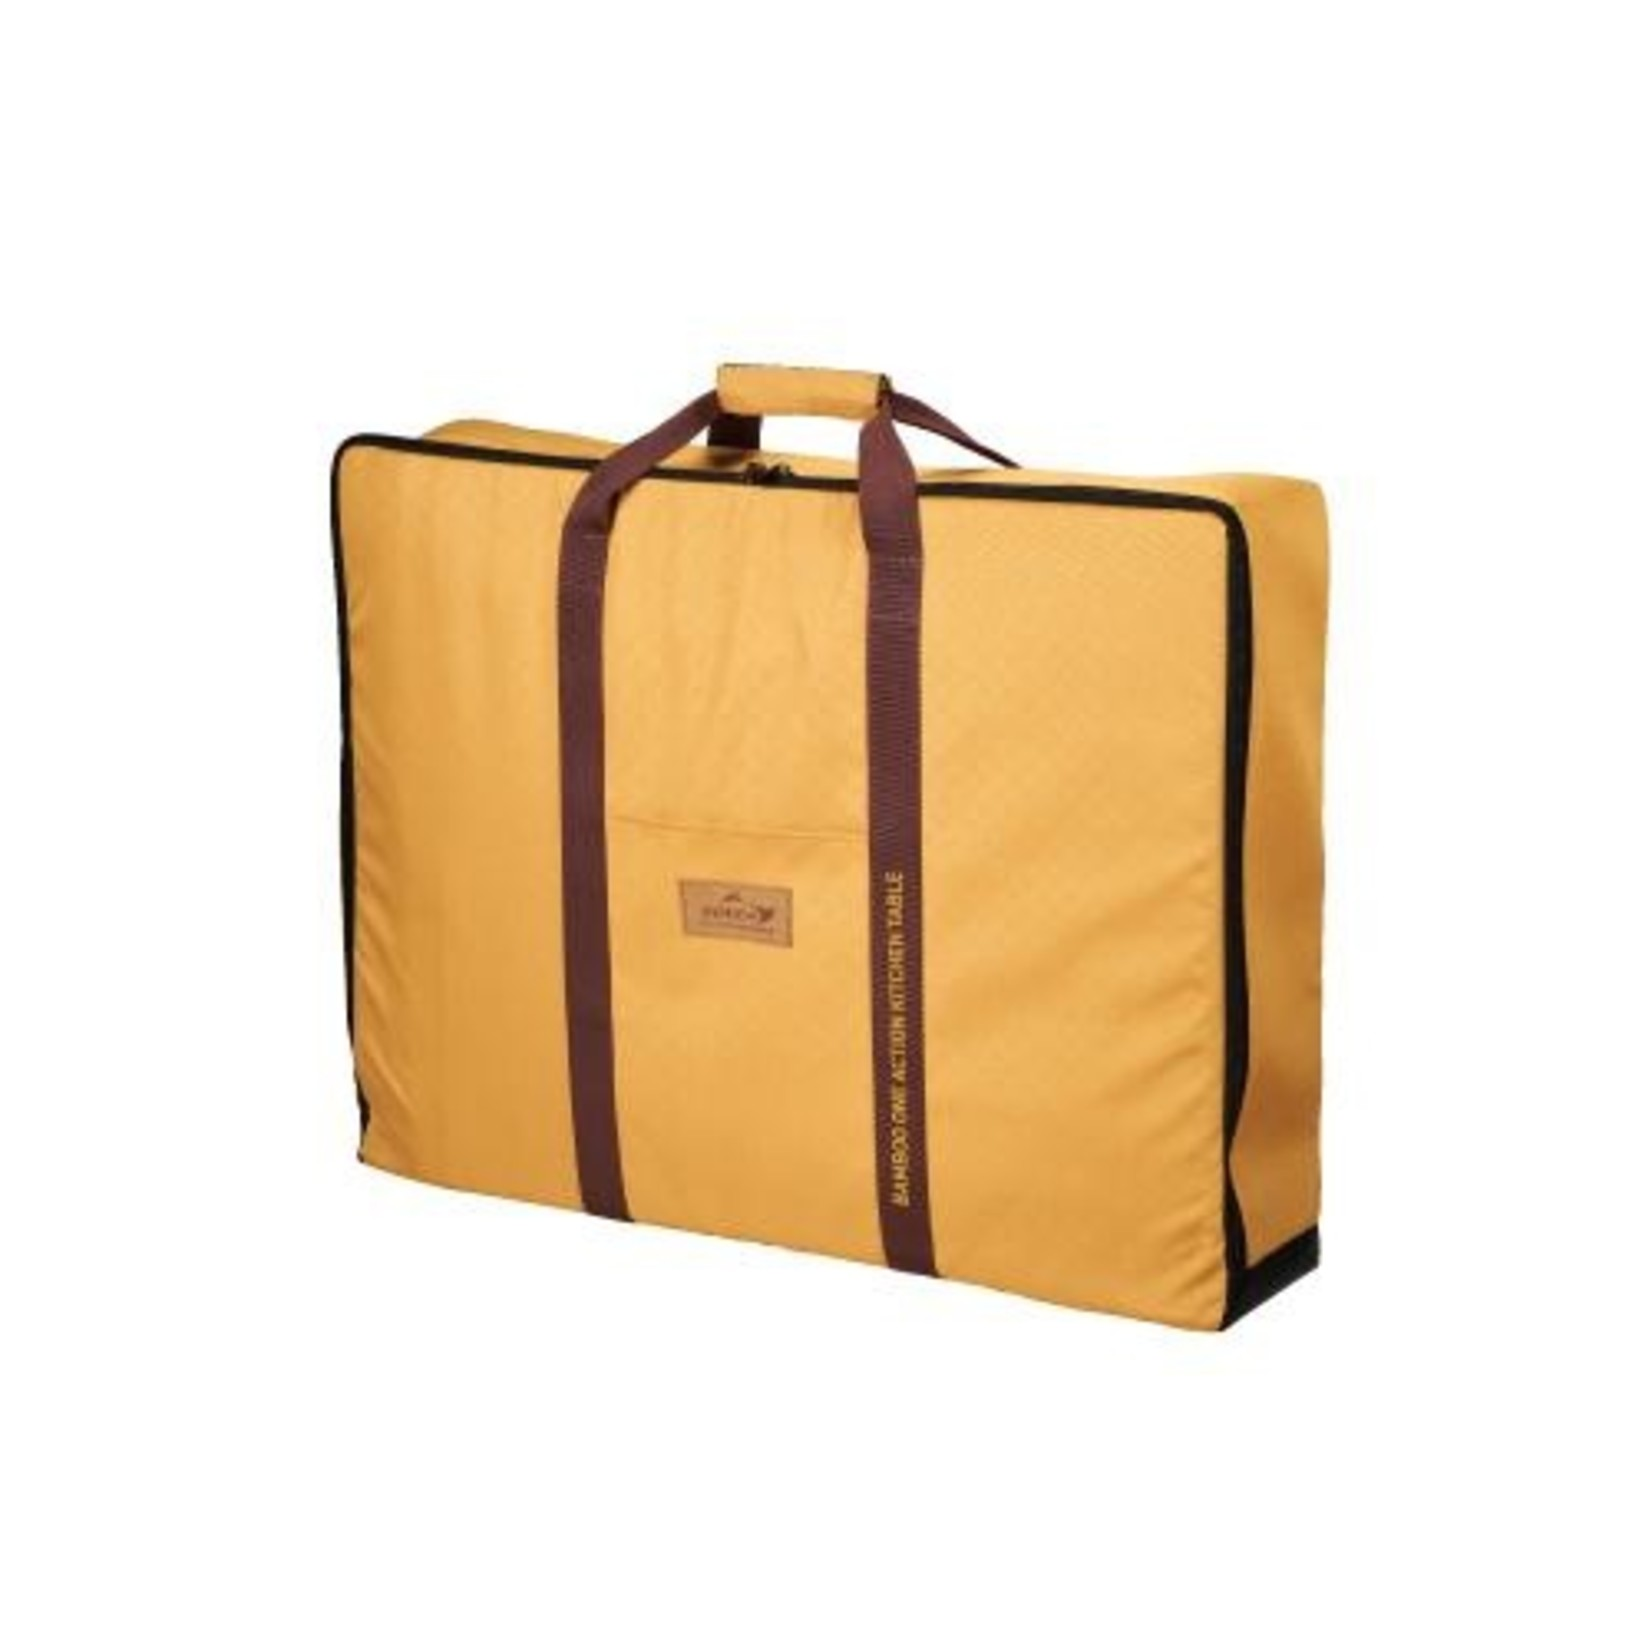 Kovea Kovea Bamboo One Action Table Carry Bag